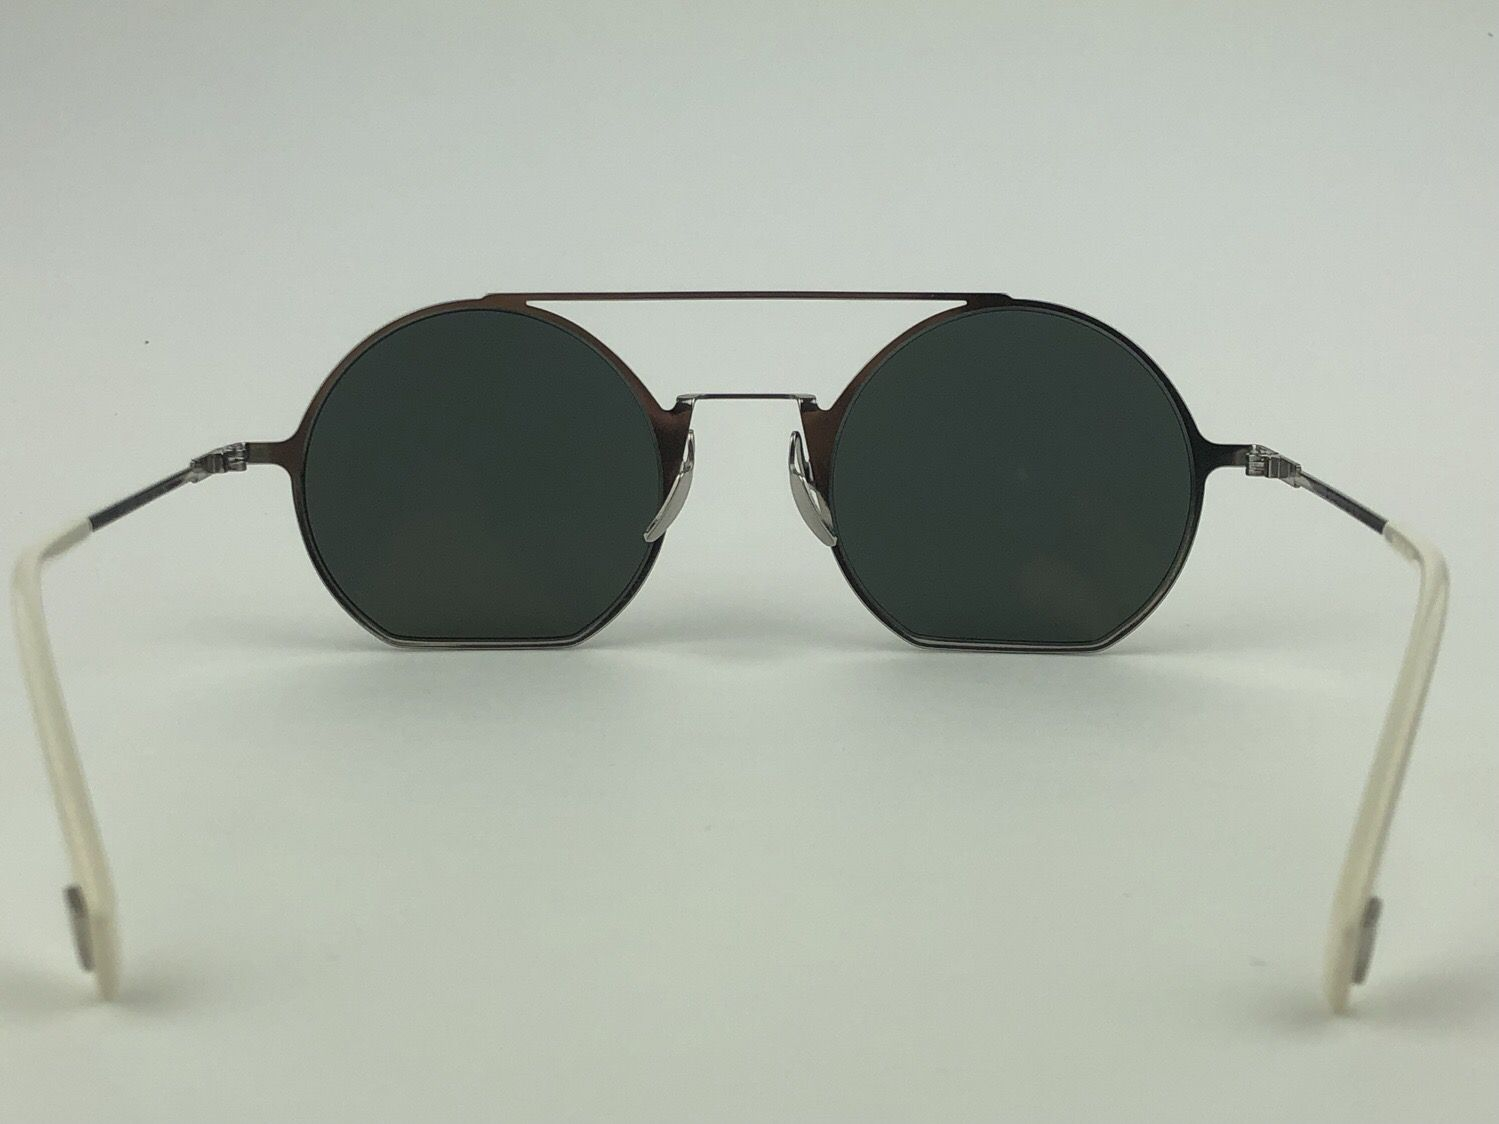 Óculos de sol Fendi FD0291 010 48